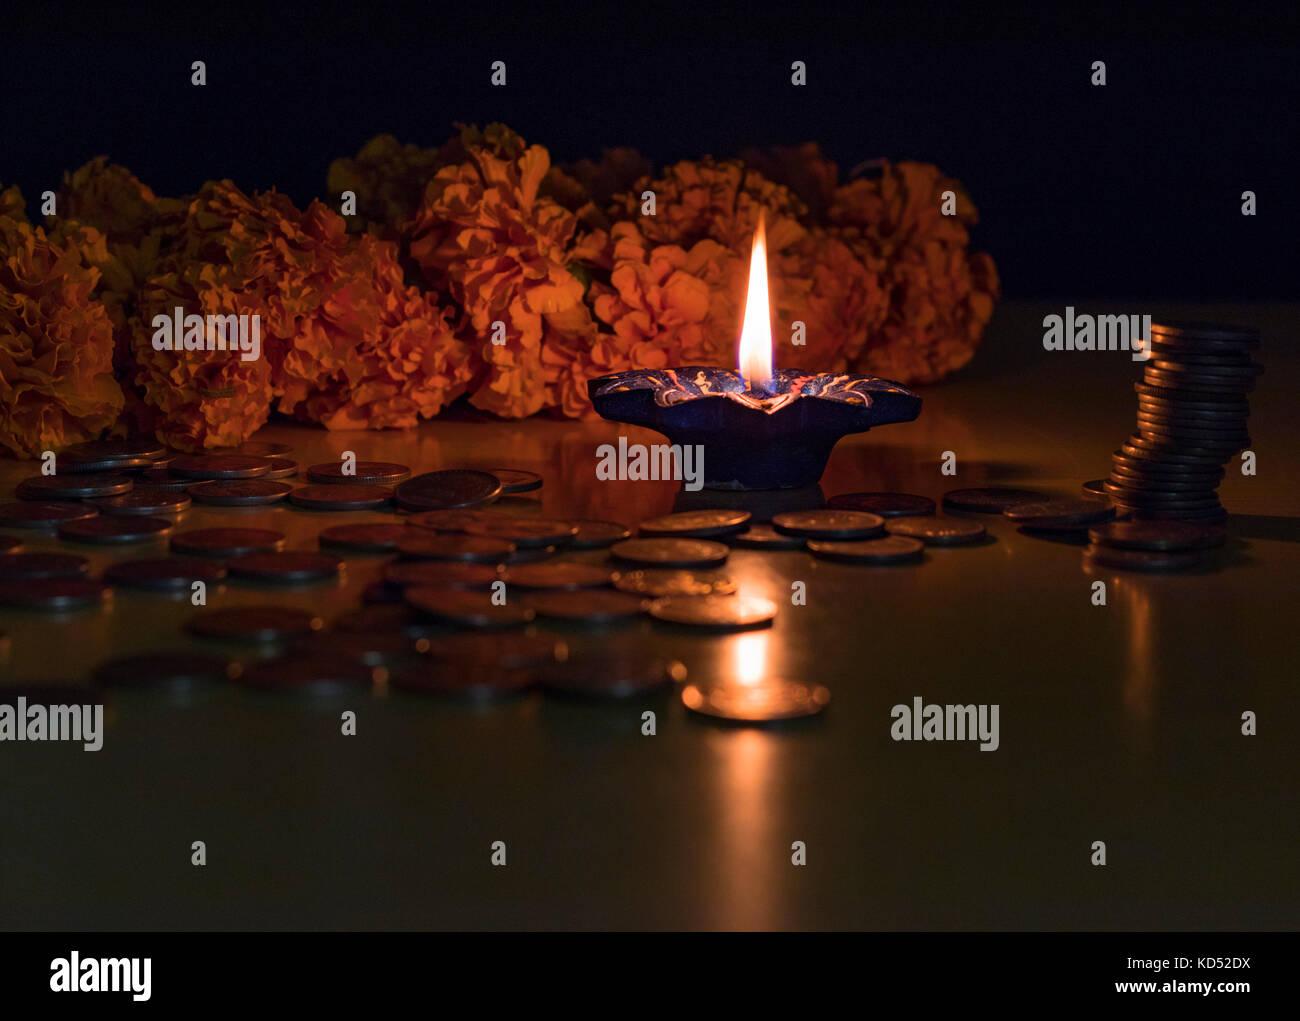 Happy Diwali Wishes And Greetings Stock Photo 162995558 Alamy